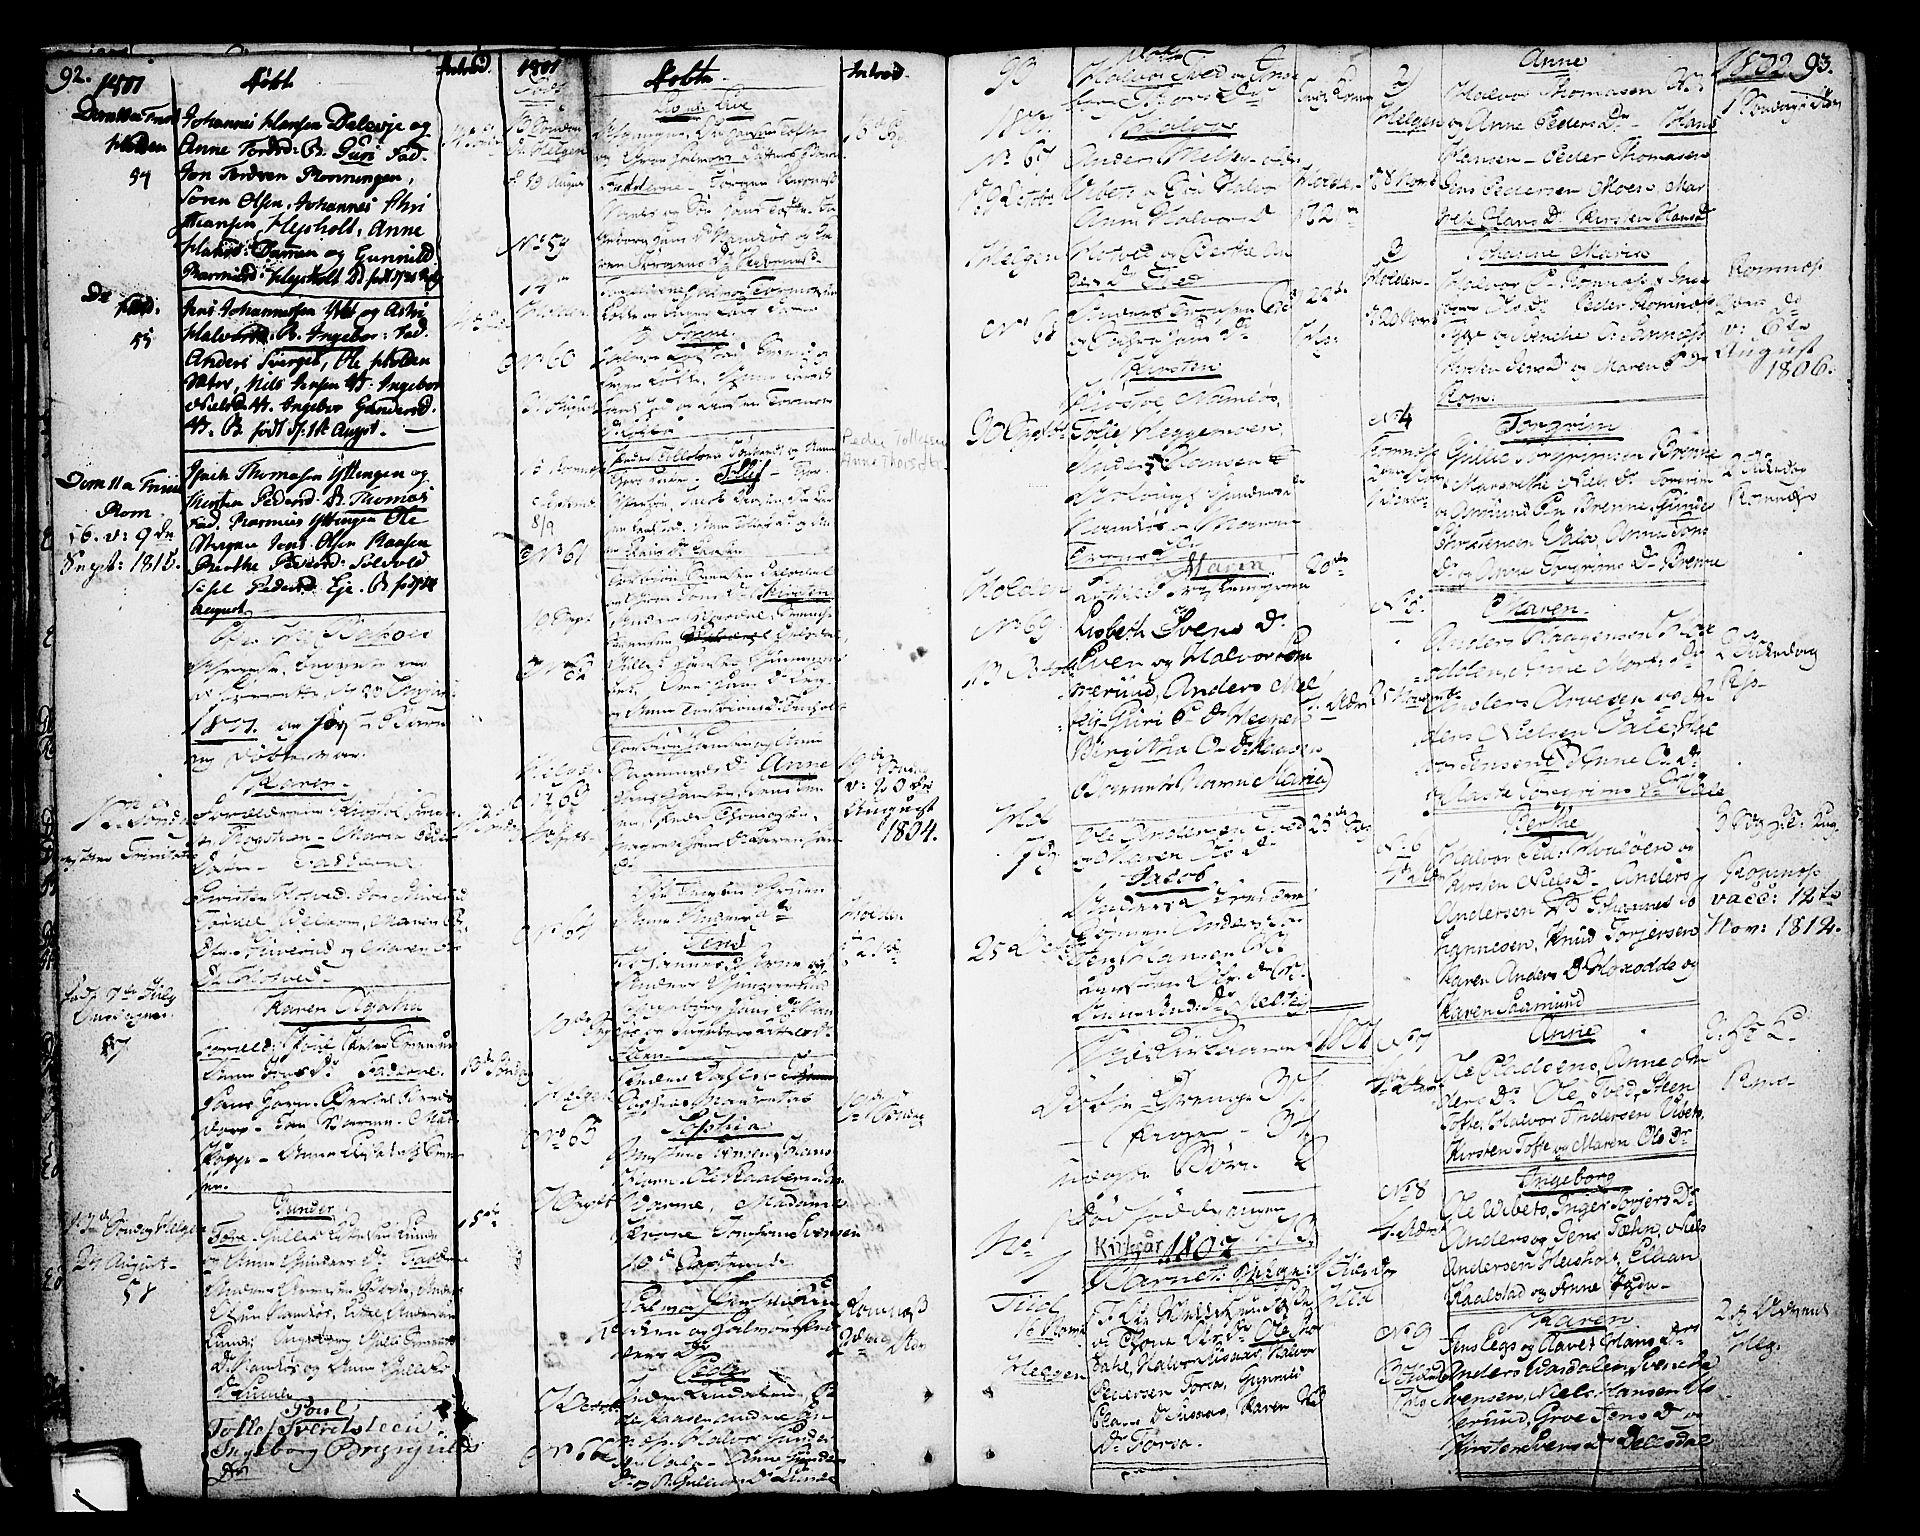 SAKO, Holla kirkebøker, F/Fa/L0002: Ministerialbok nr. 2, 1779-1814, s. 92-93